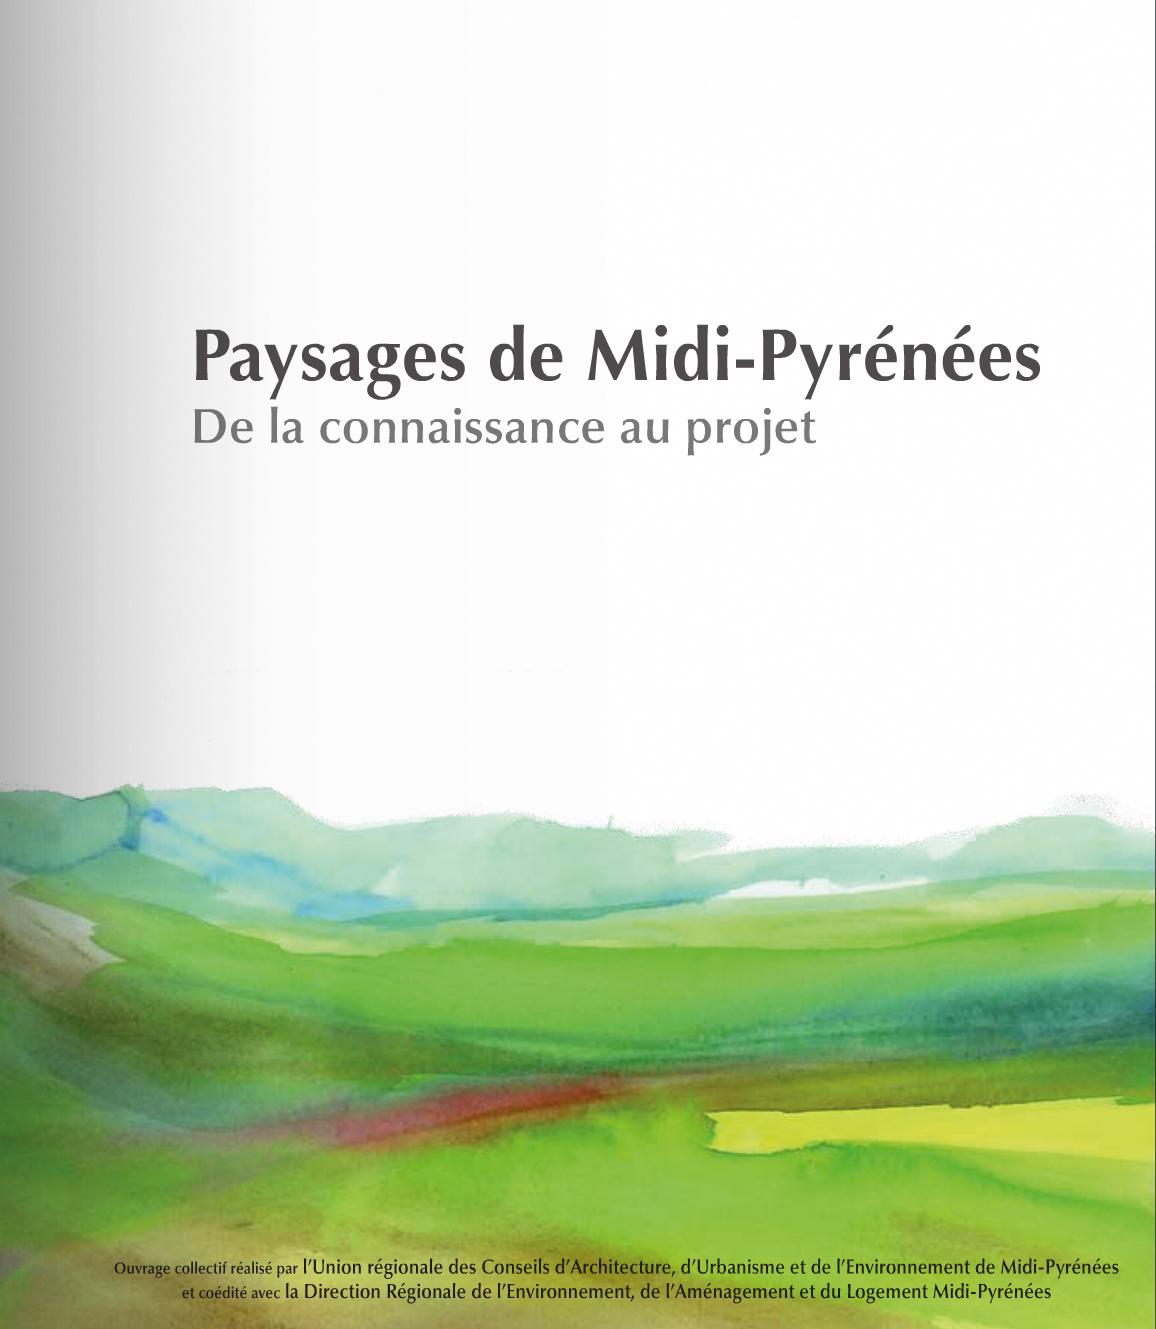 Architecte Paysagiste Midi Pyrénées paysages de midi-pyrénées. de la connaissance au projet